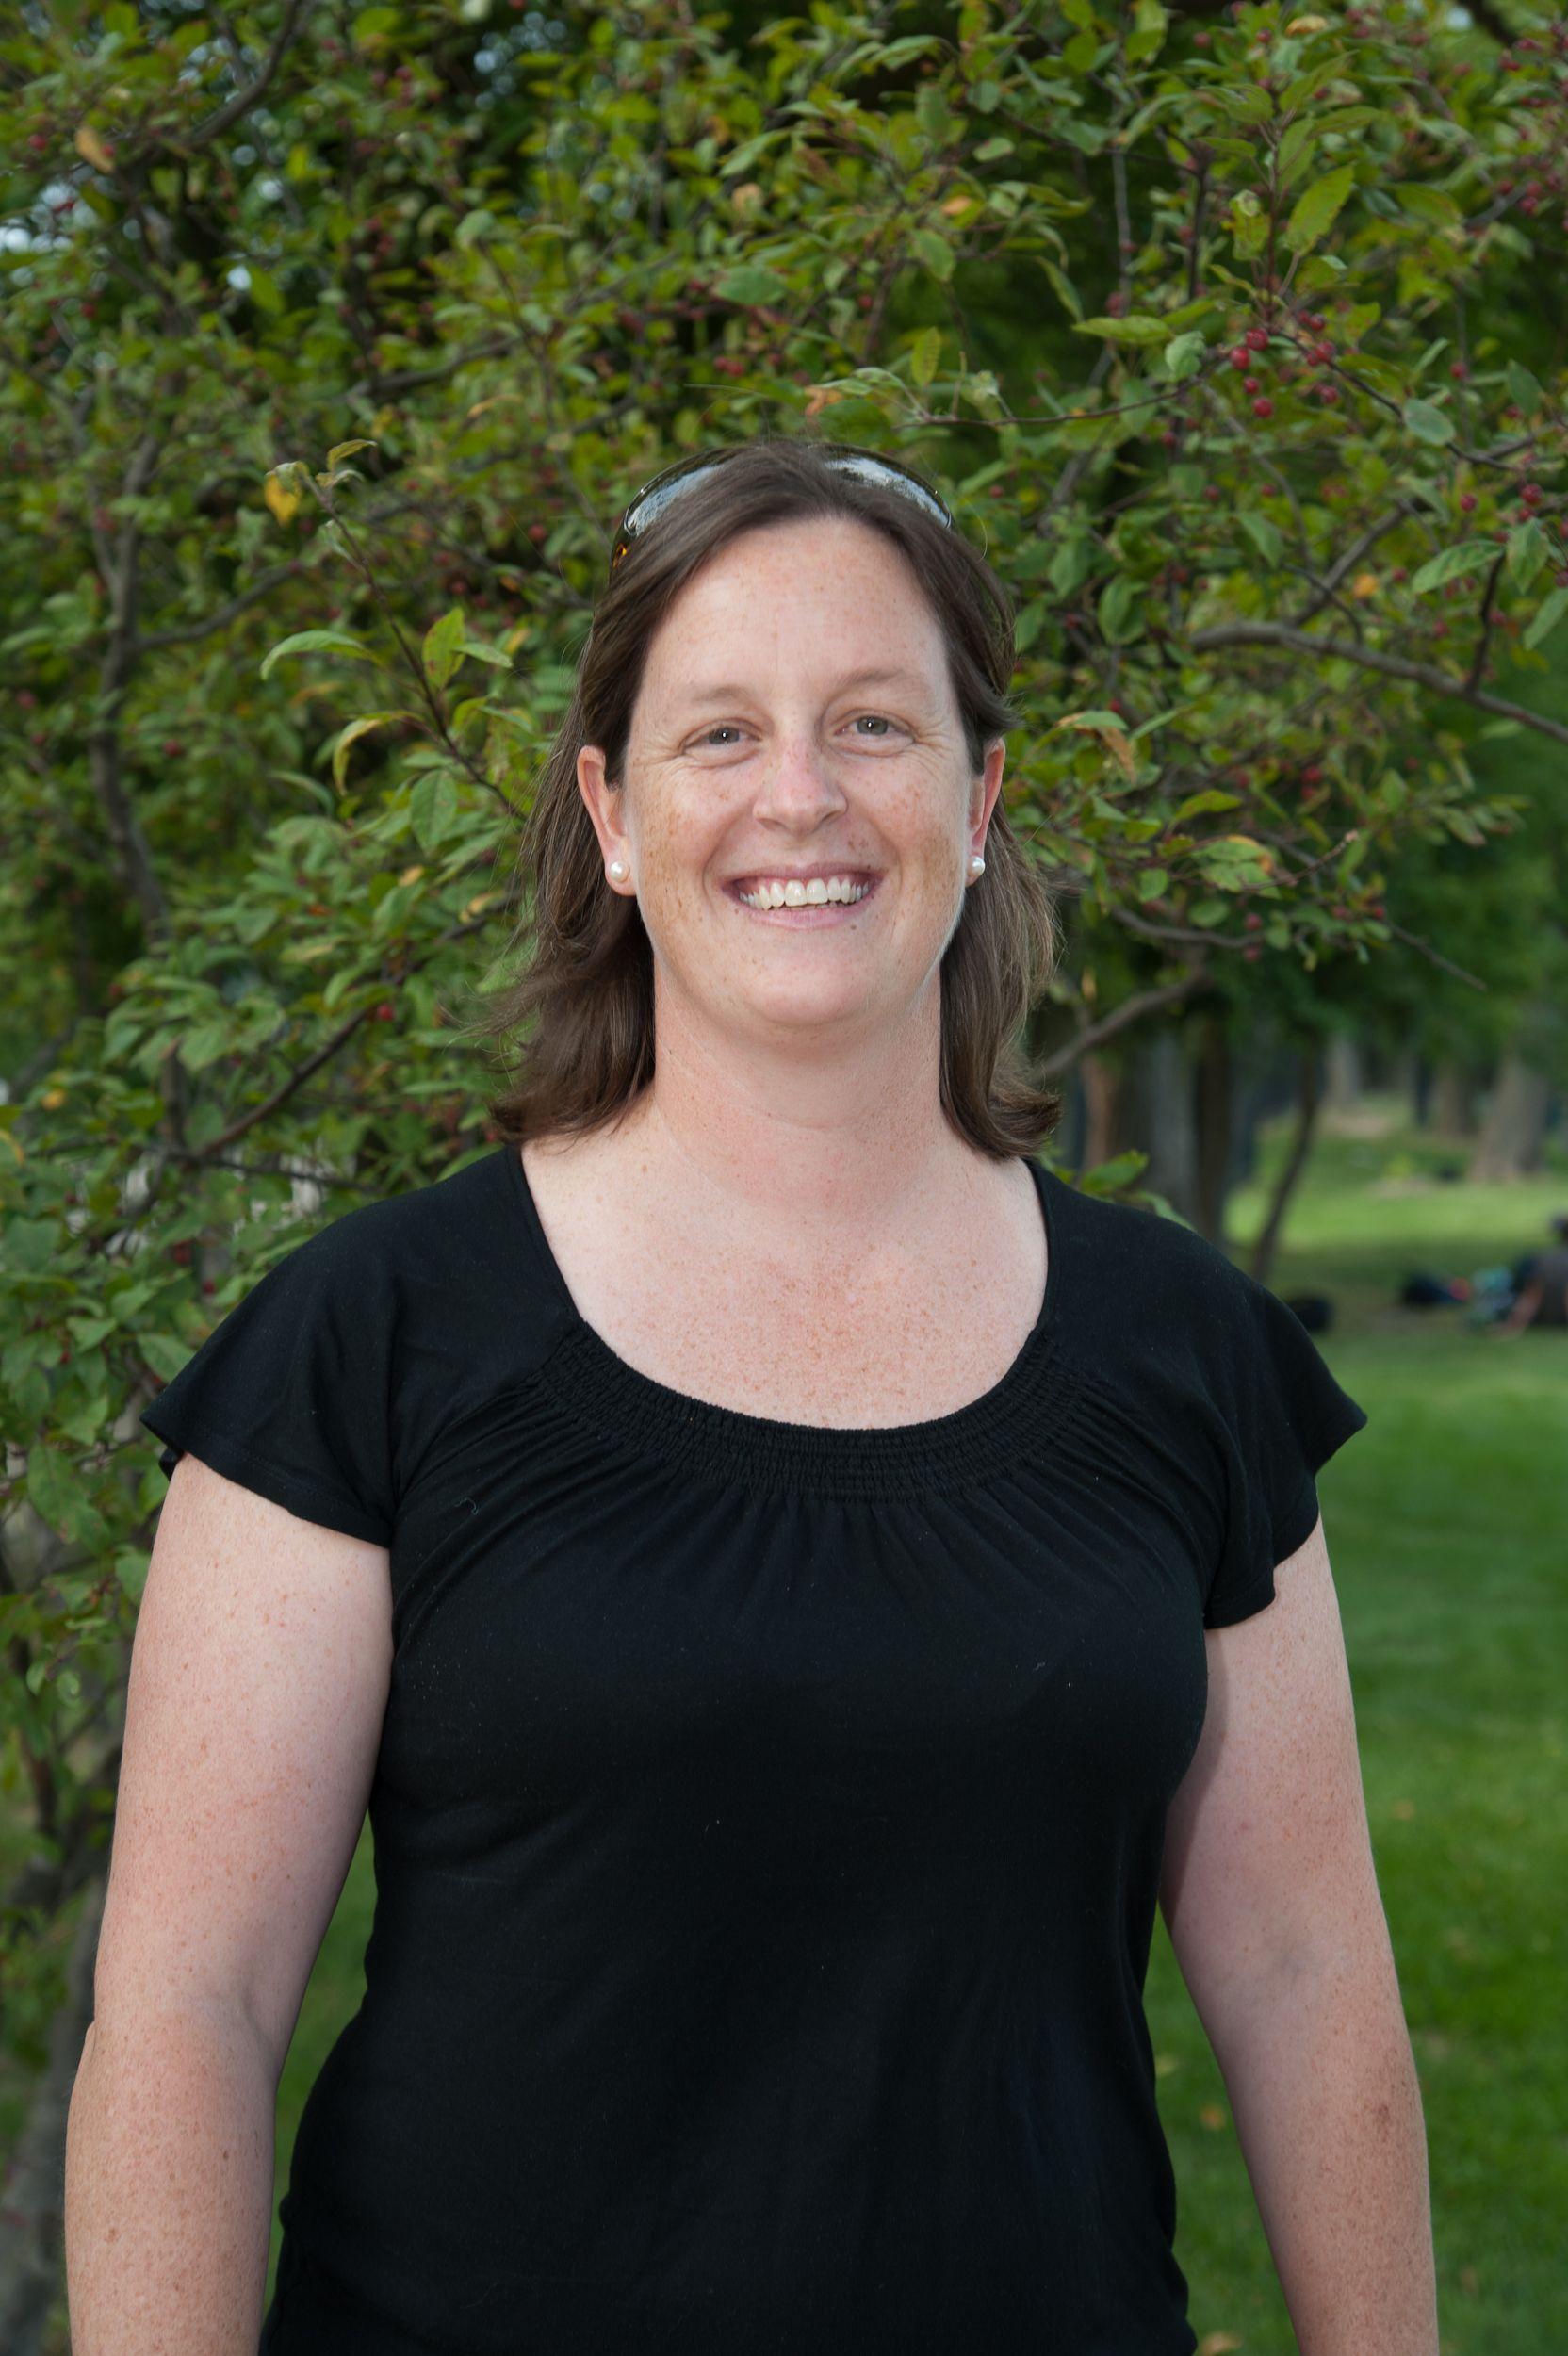 Lizzy Giffen, Upper School English Teacher. Colby College